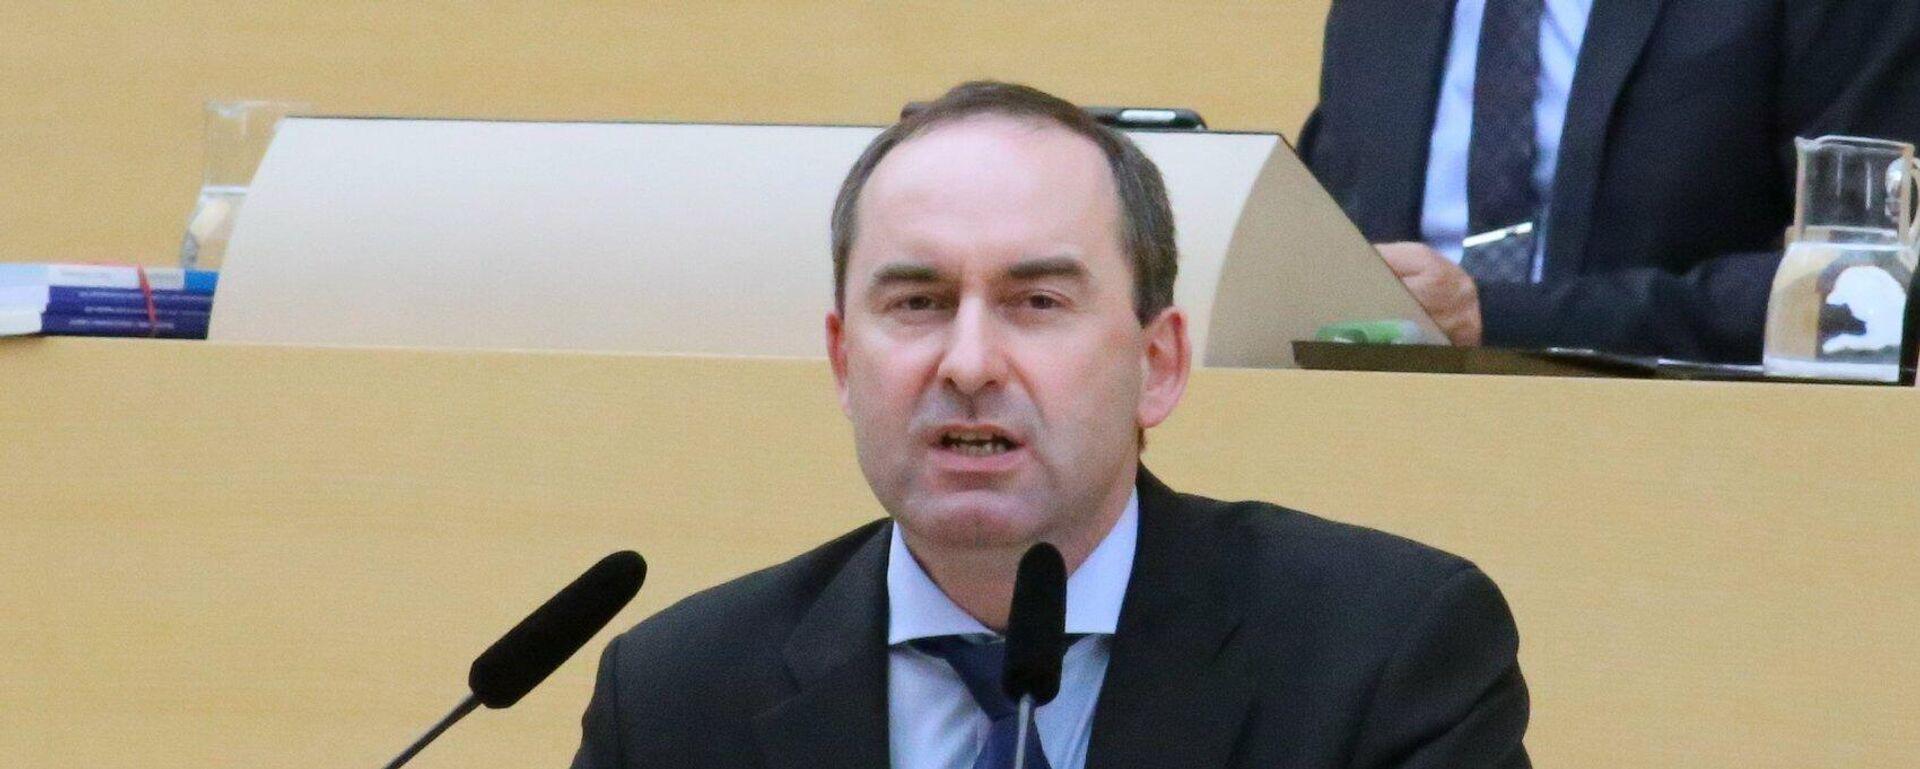 Bayerns stellvertretender Ministerpräsident Hubert Aiwanger (Freie Wähler) - SNA, 1920, 05.07.2021